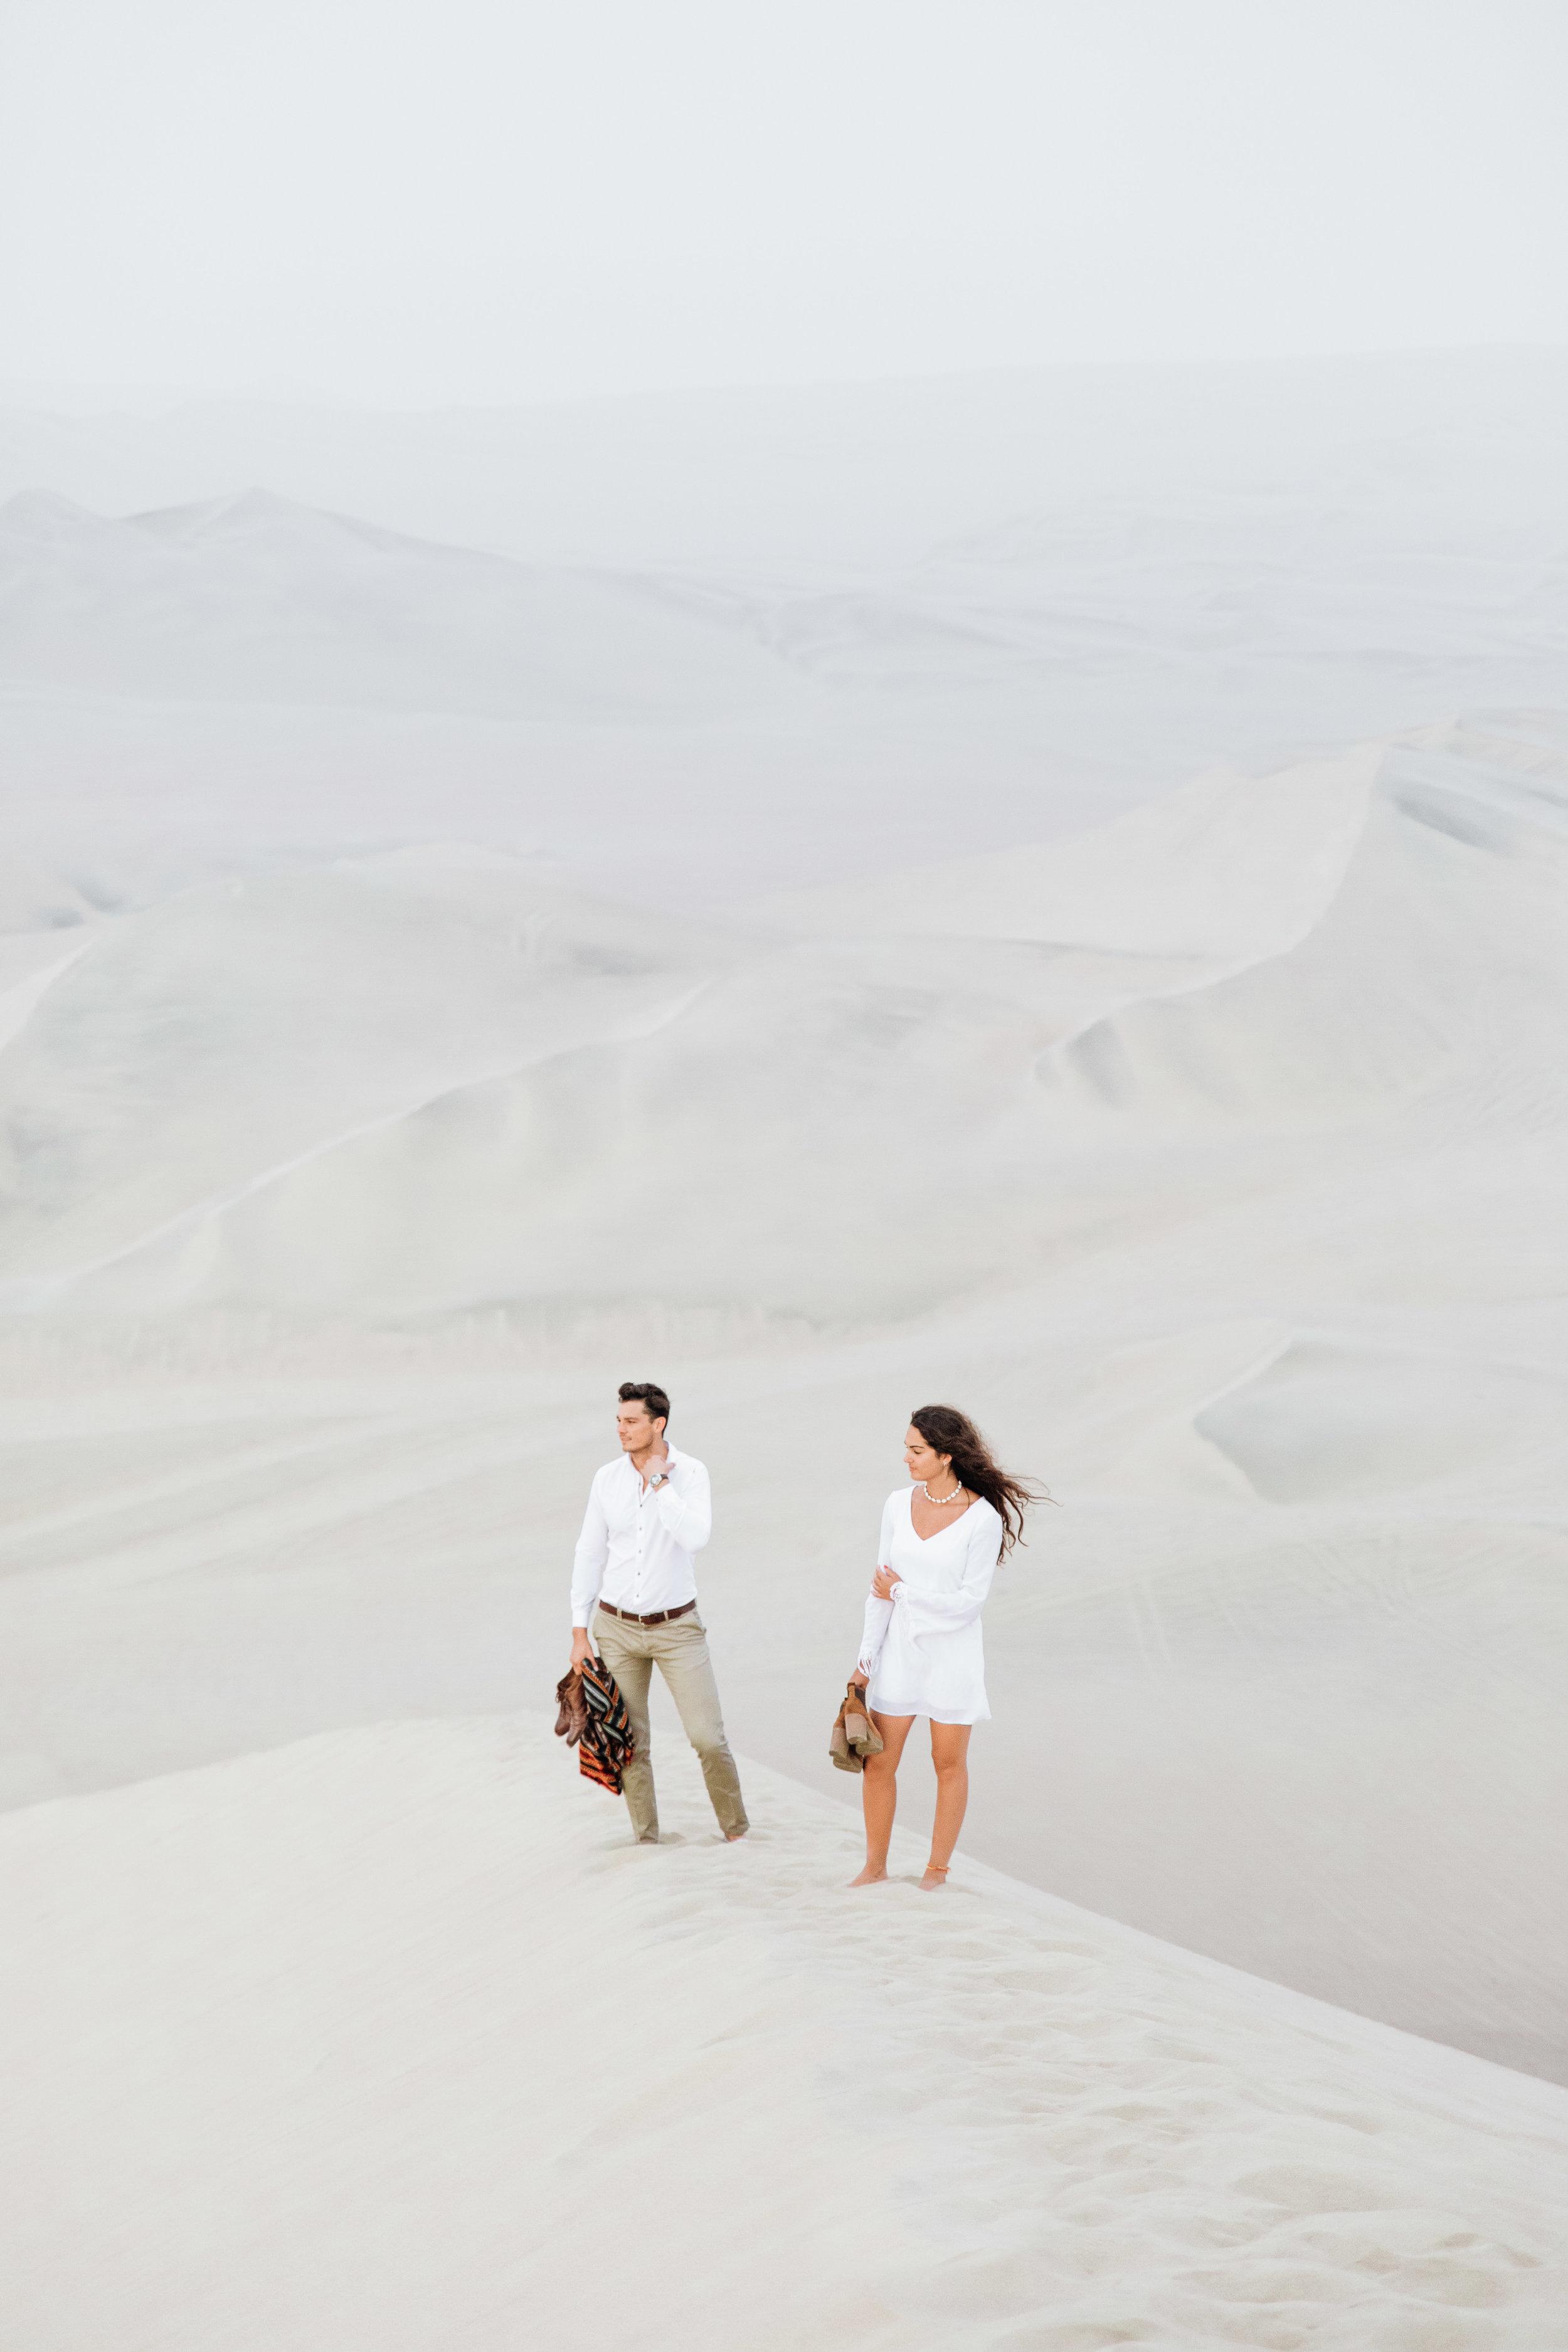 huacachina-peru-honeymoon-elopement-destination-wedding-photography-michael-cozzens-14.jpg